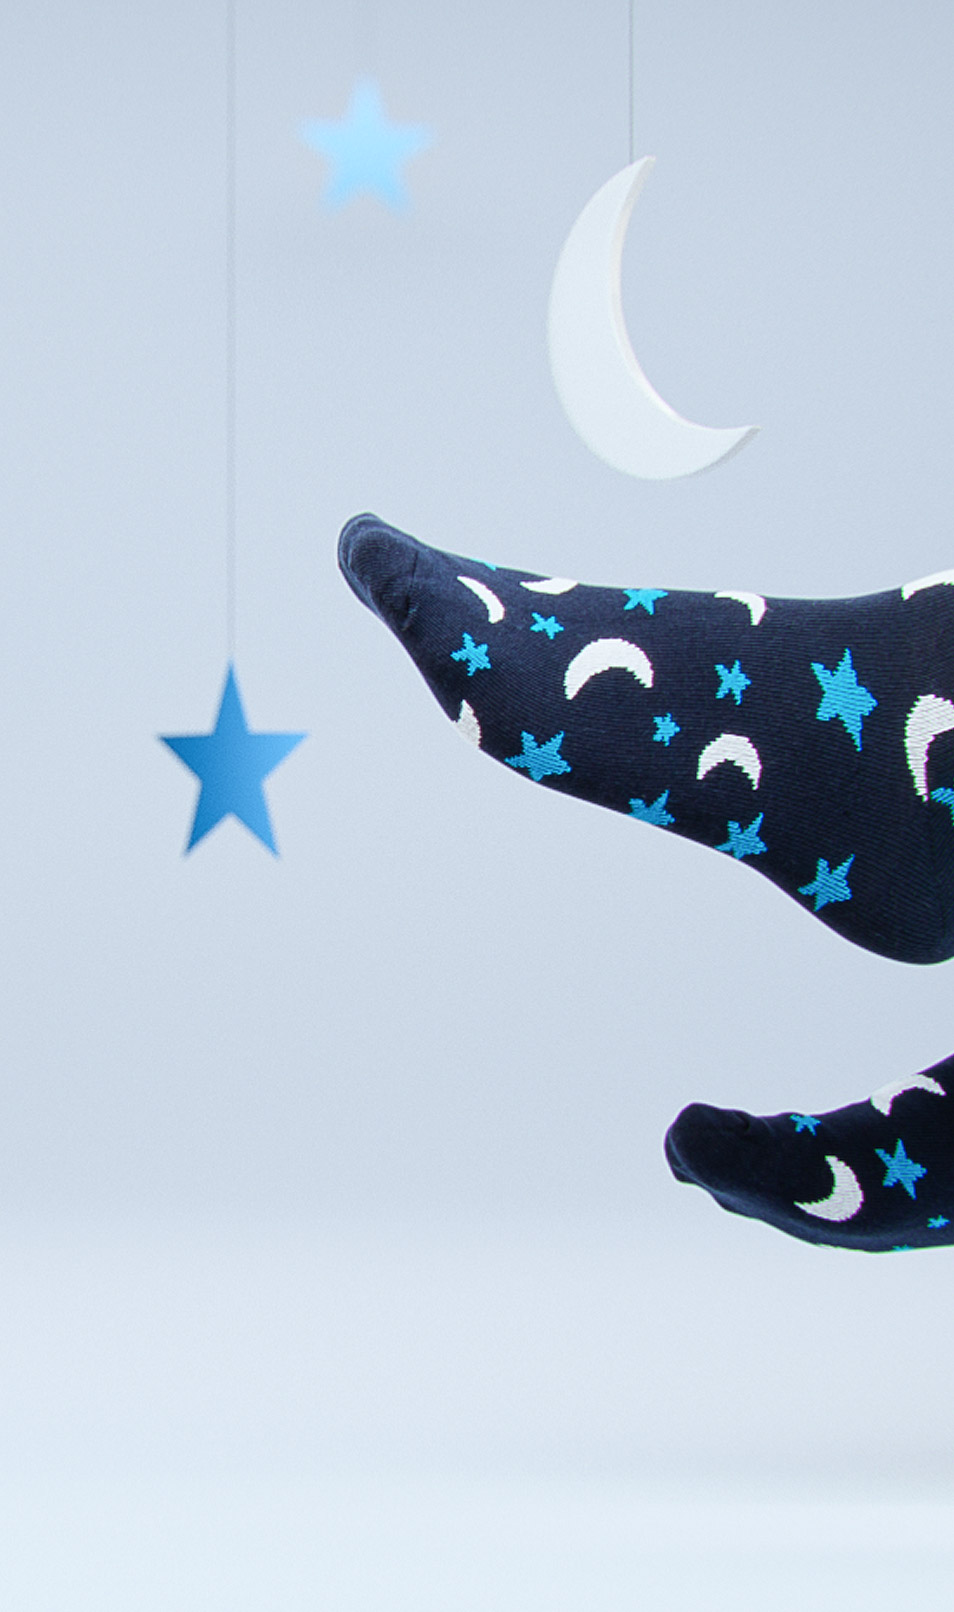 Night-time-socks-Edited-mob–